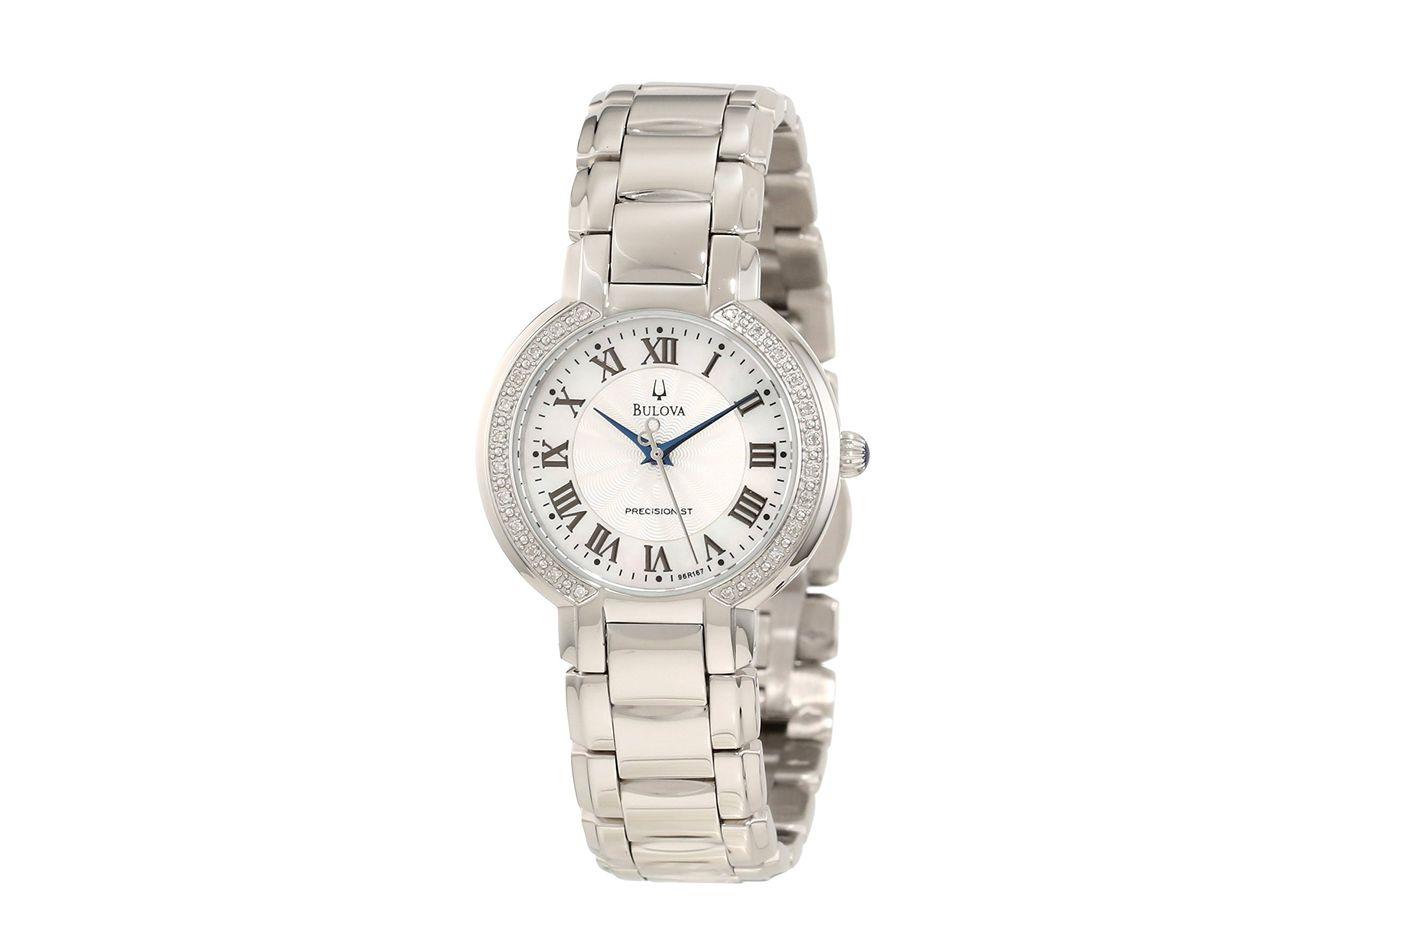 Bulova Diamond-Accented Watch